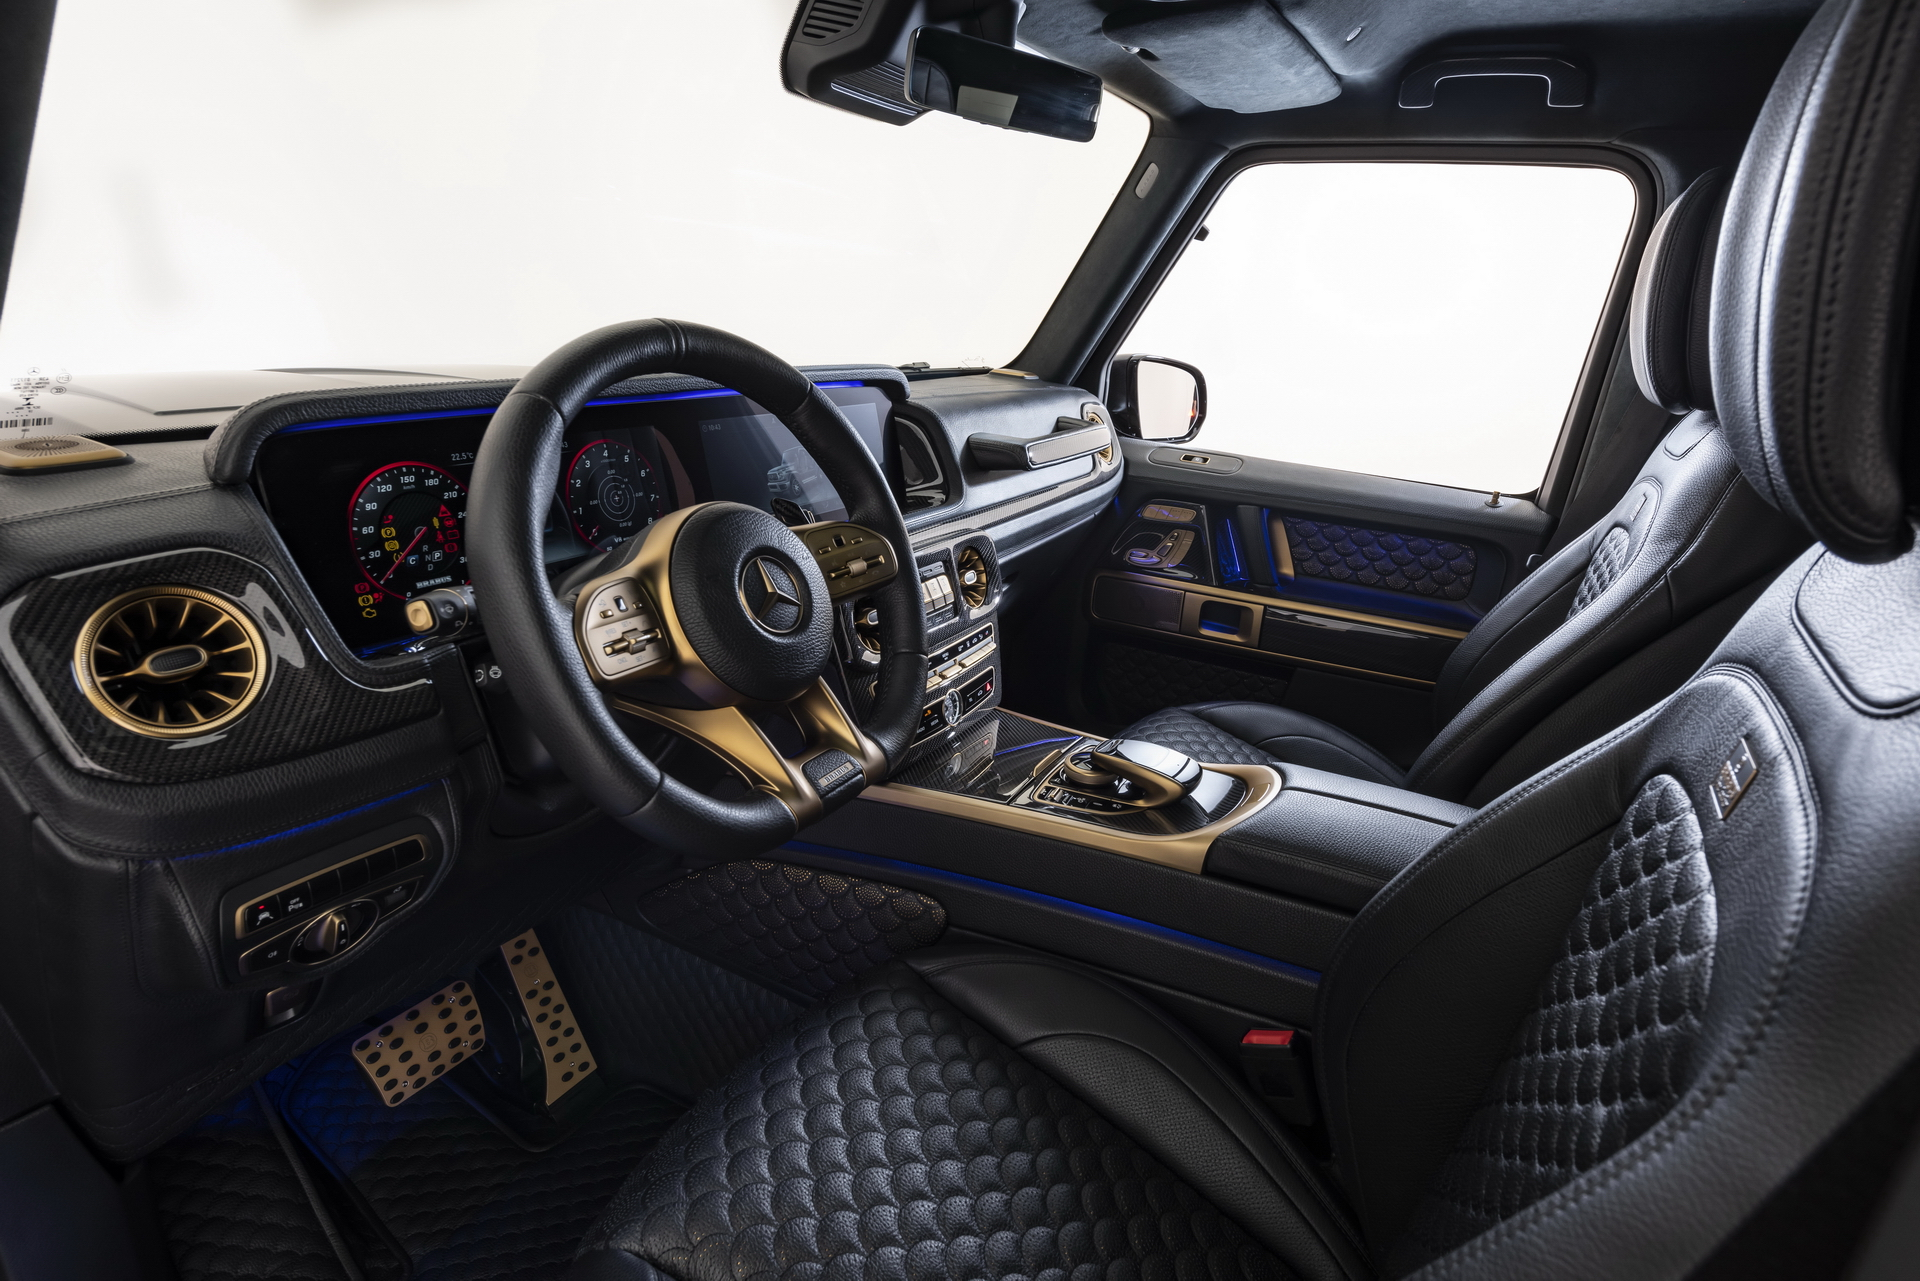 Brabus 800 Black & Gold Edition G 63